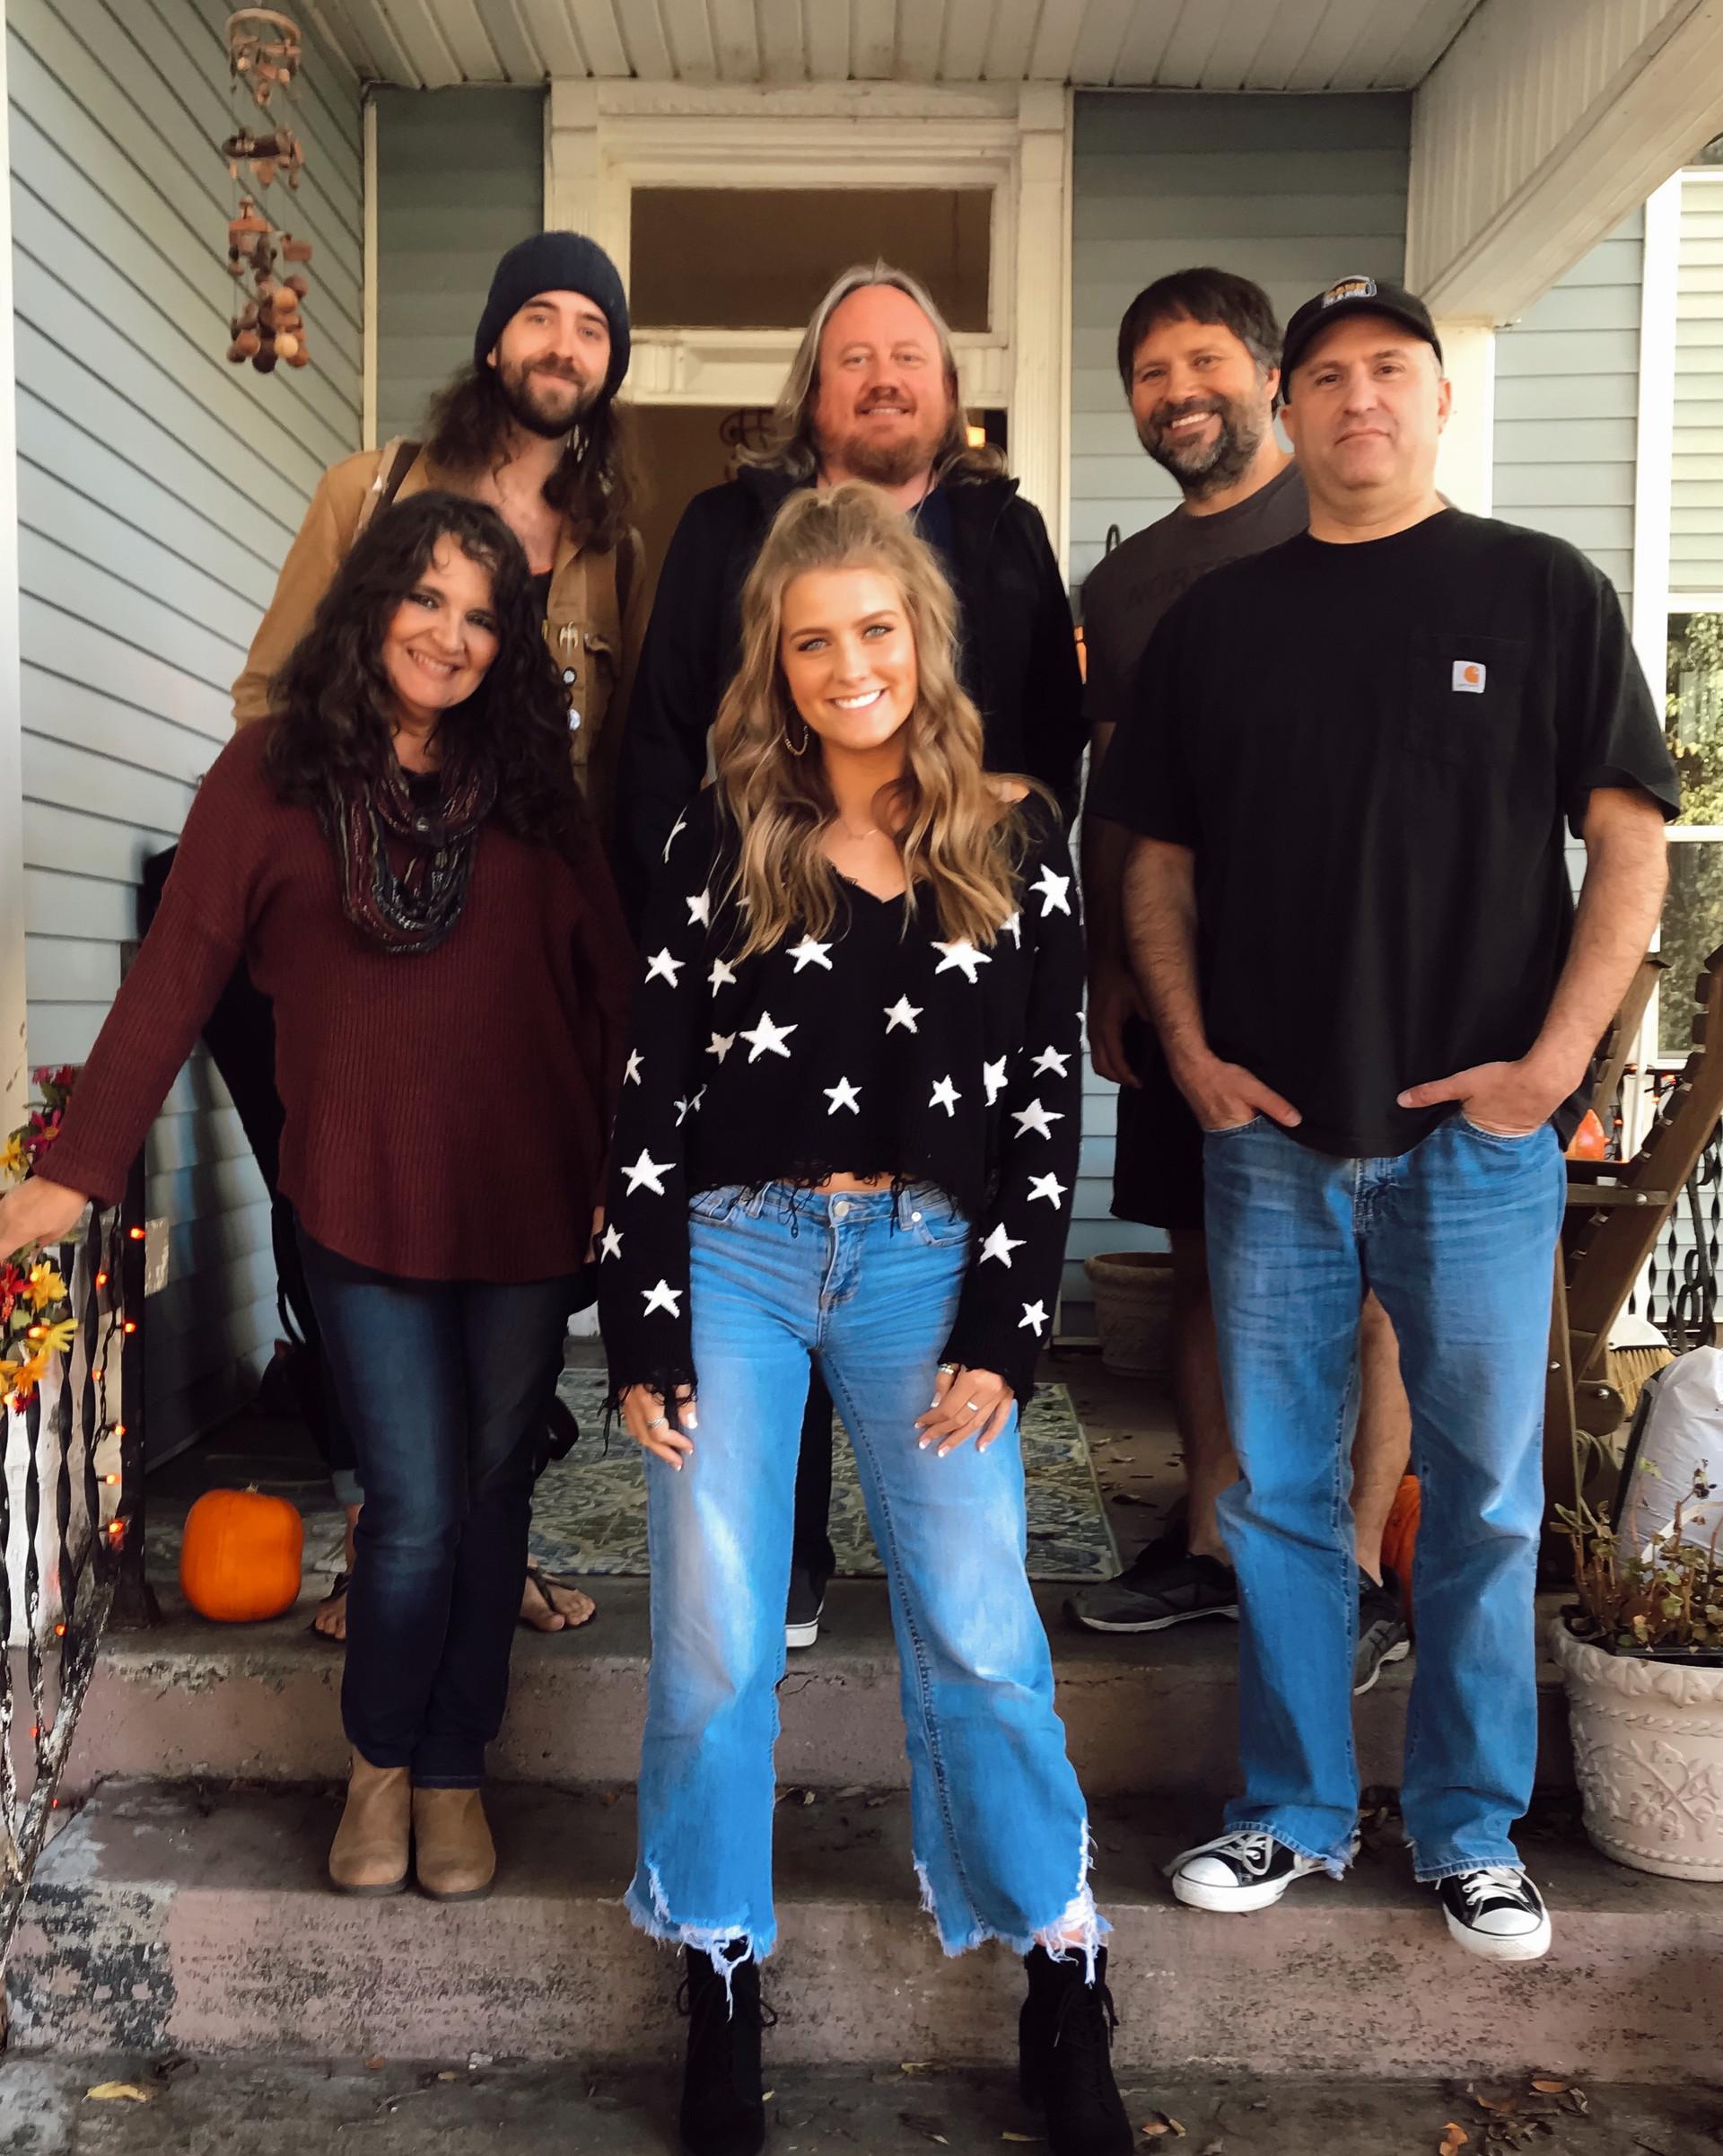 Faith, Wanda Vick, Jake Ward, Brian Allen, Mike Durham, and Greg Bieck